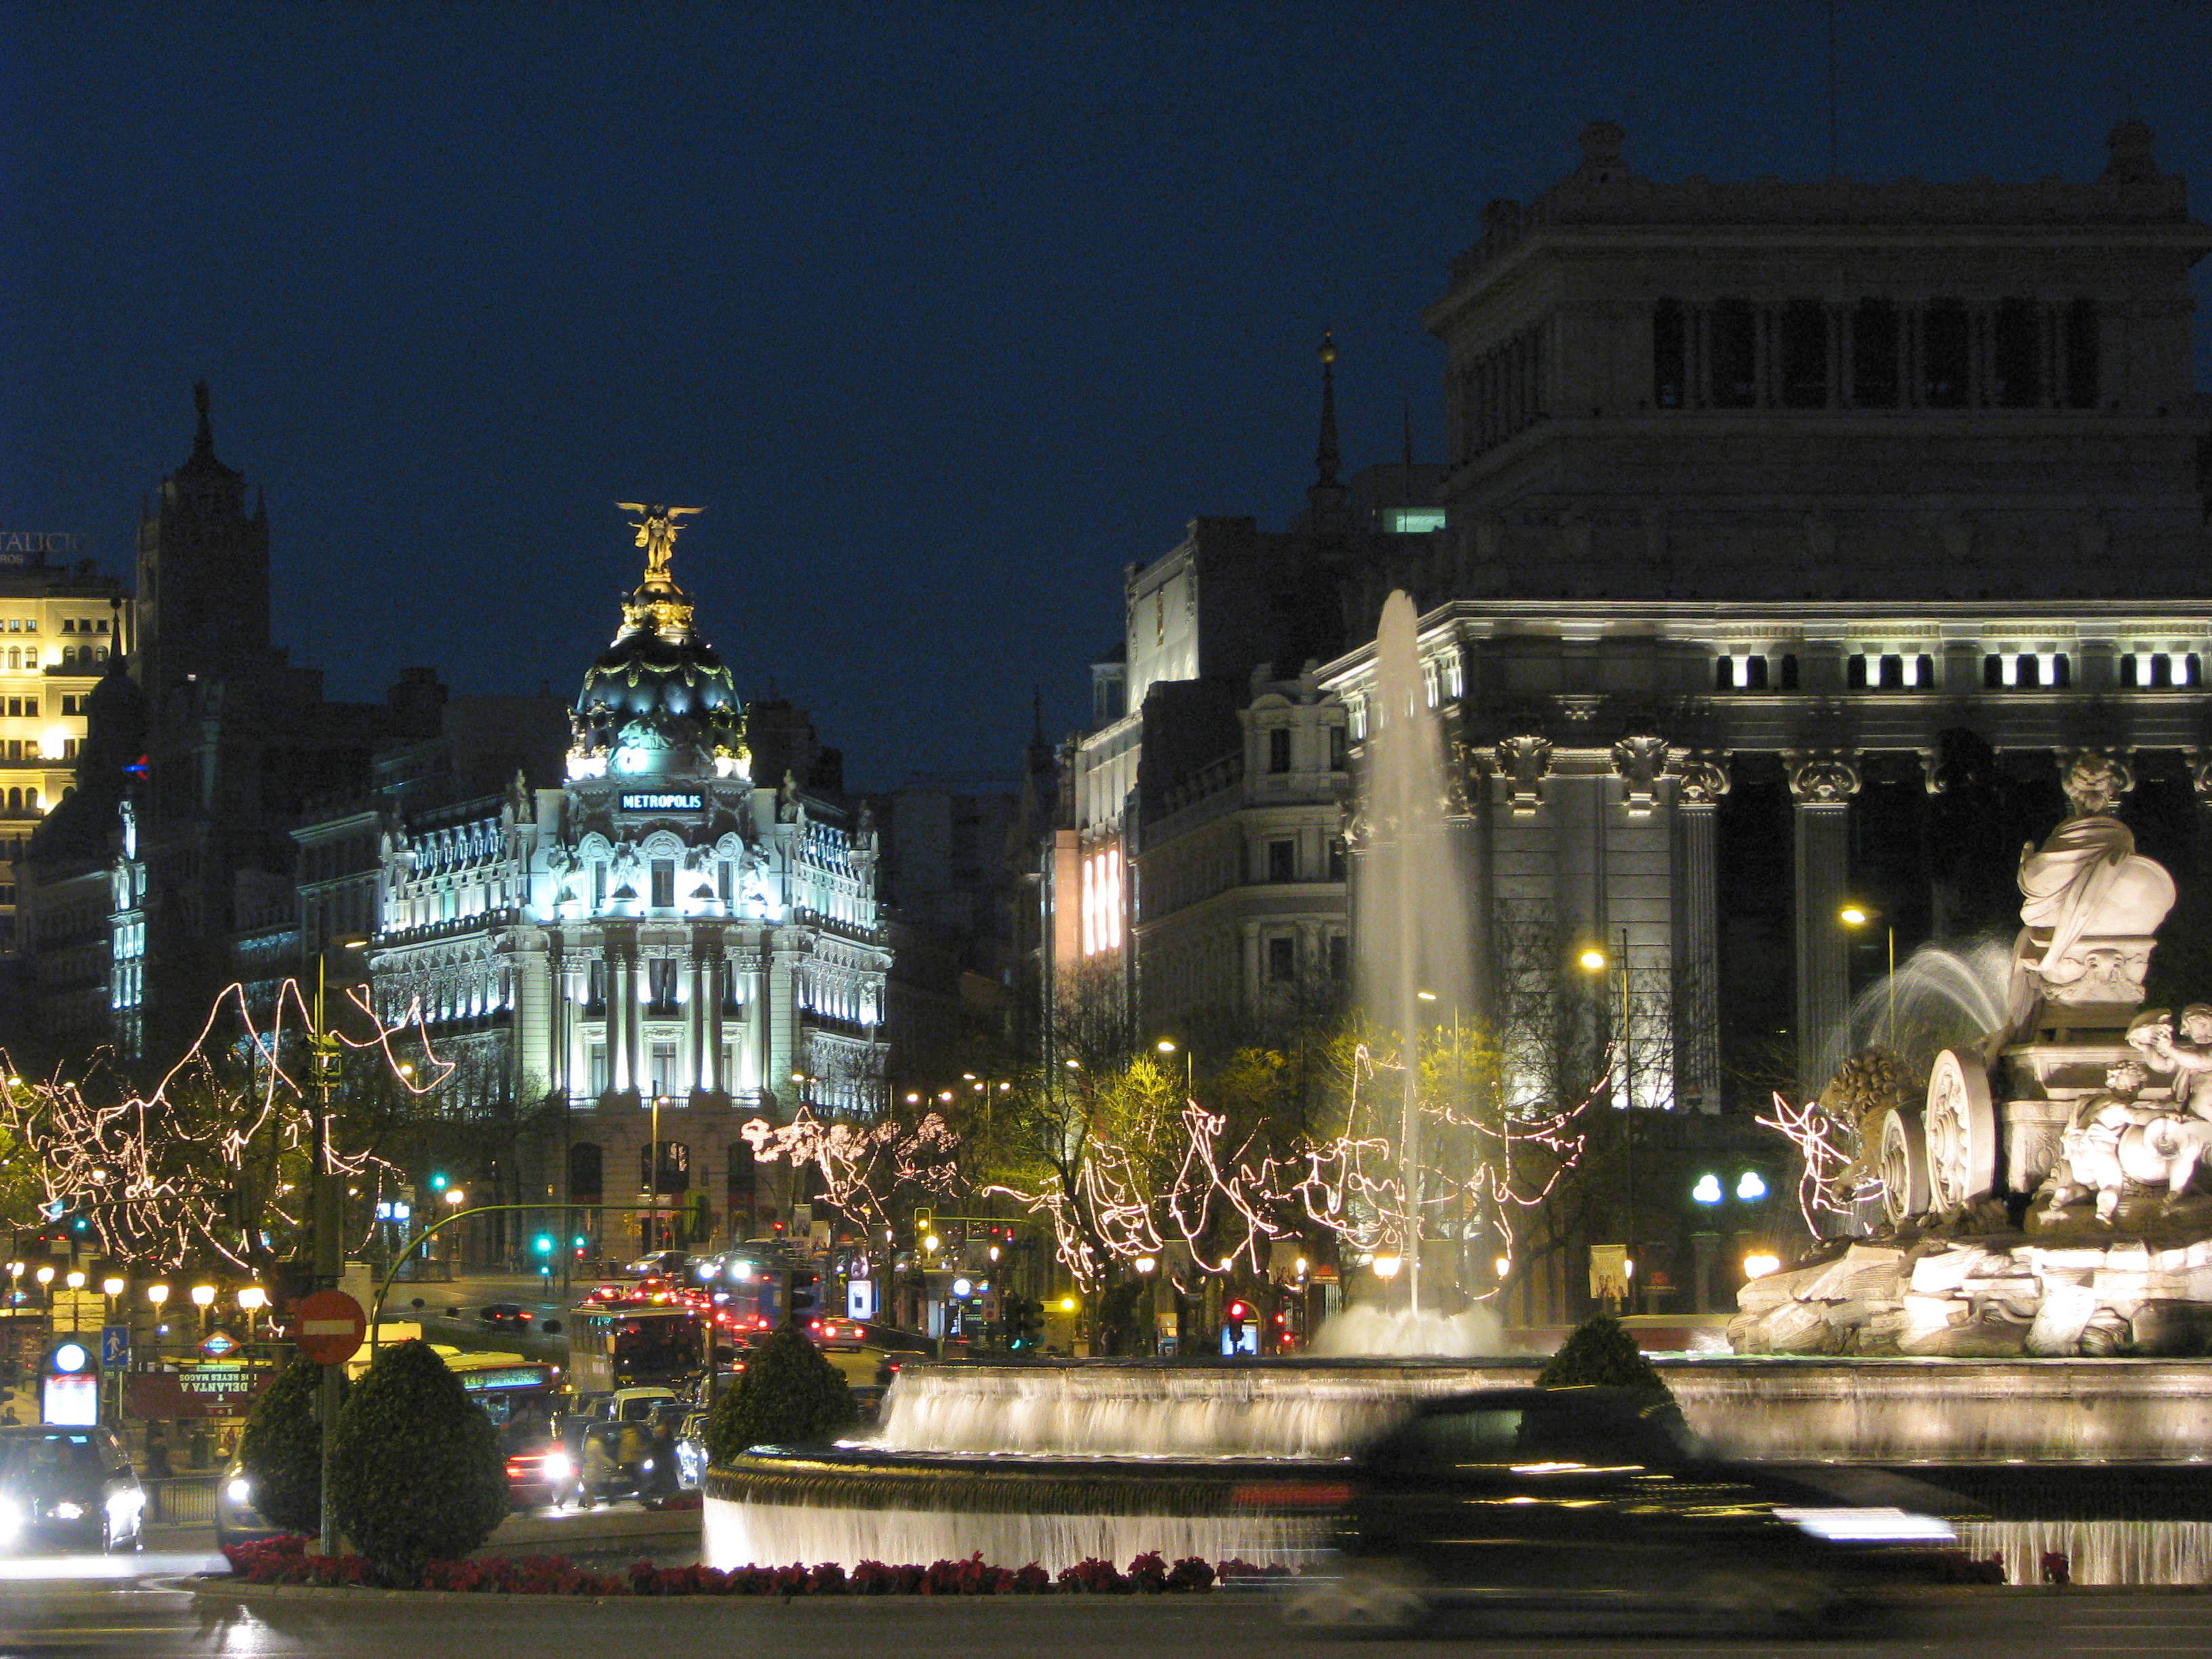 Plaza_de_Cibeles_%28Madrid%29_05.jpg